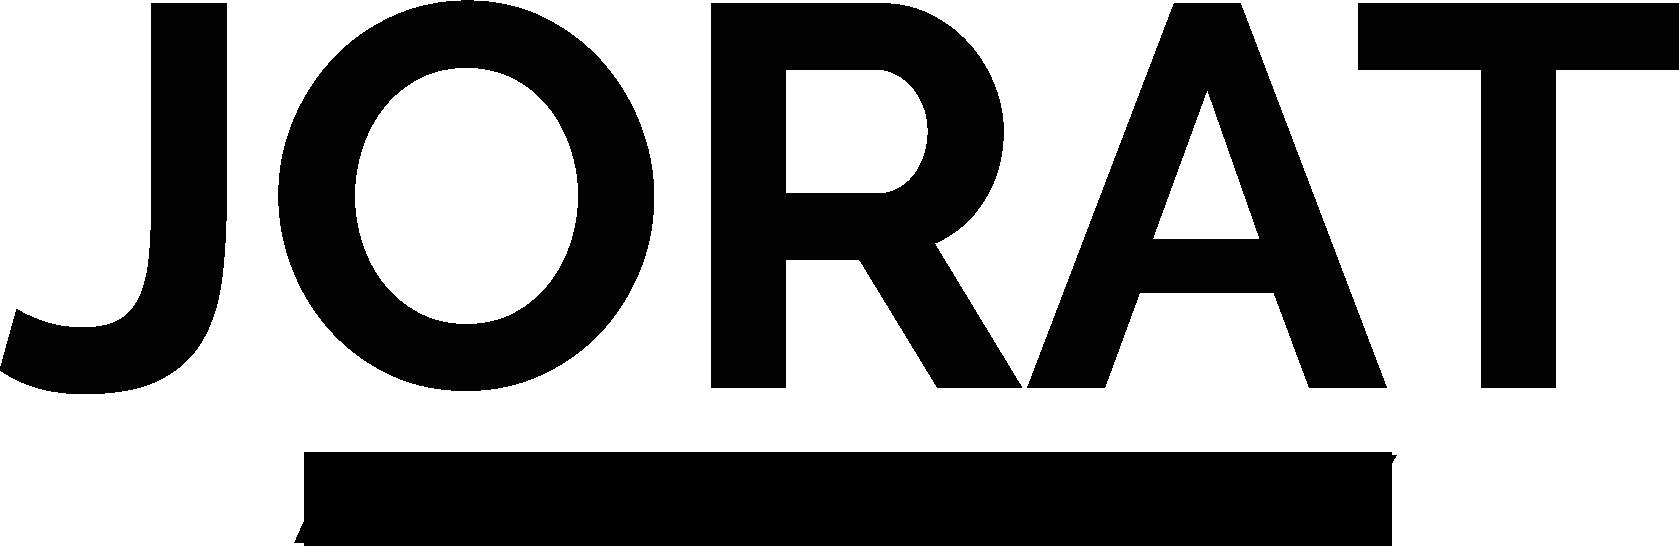 Jorat academy